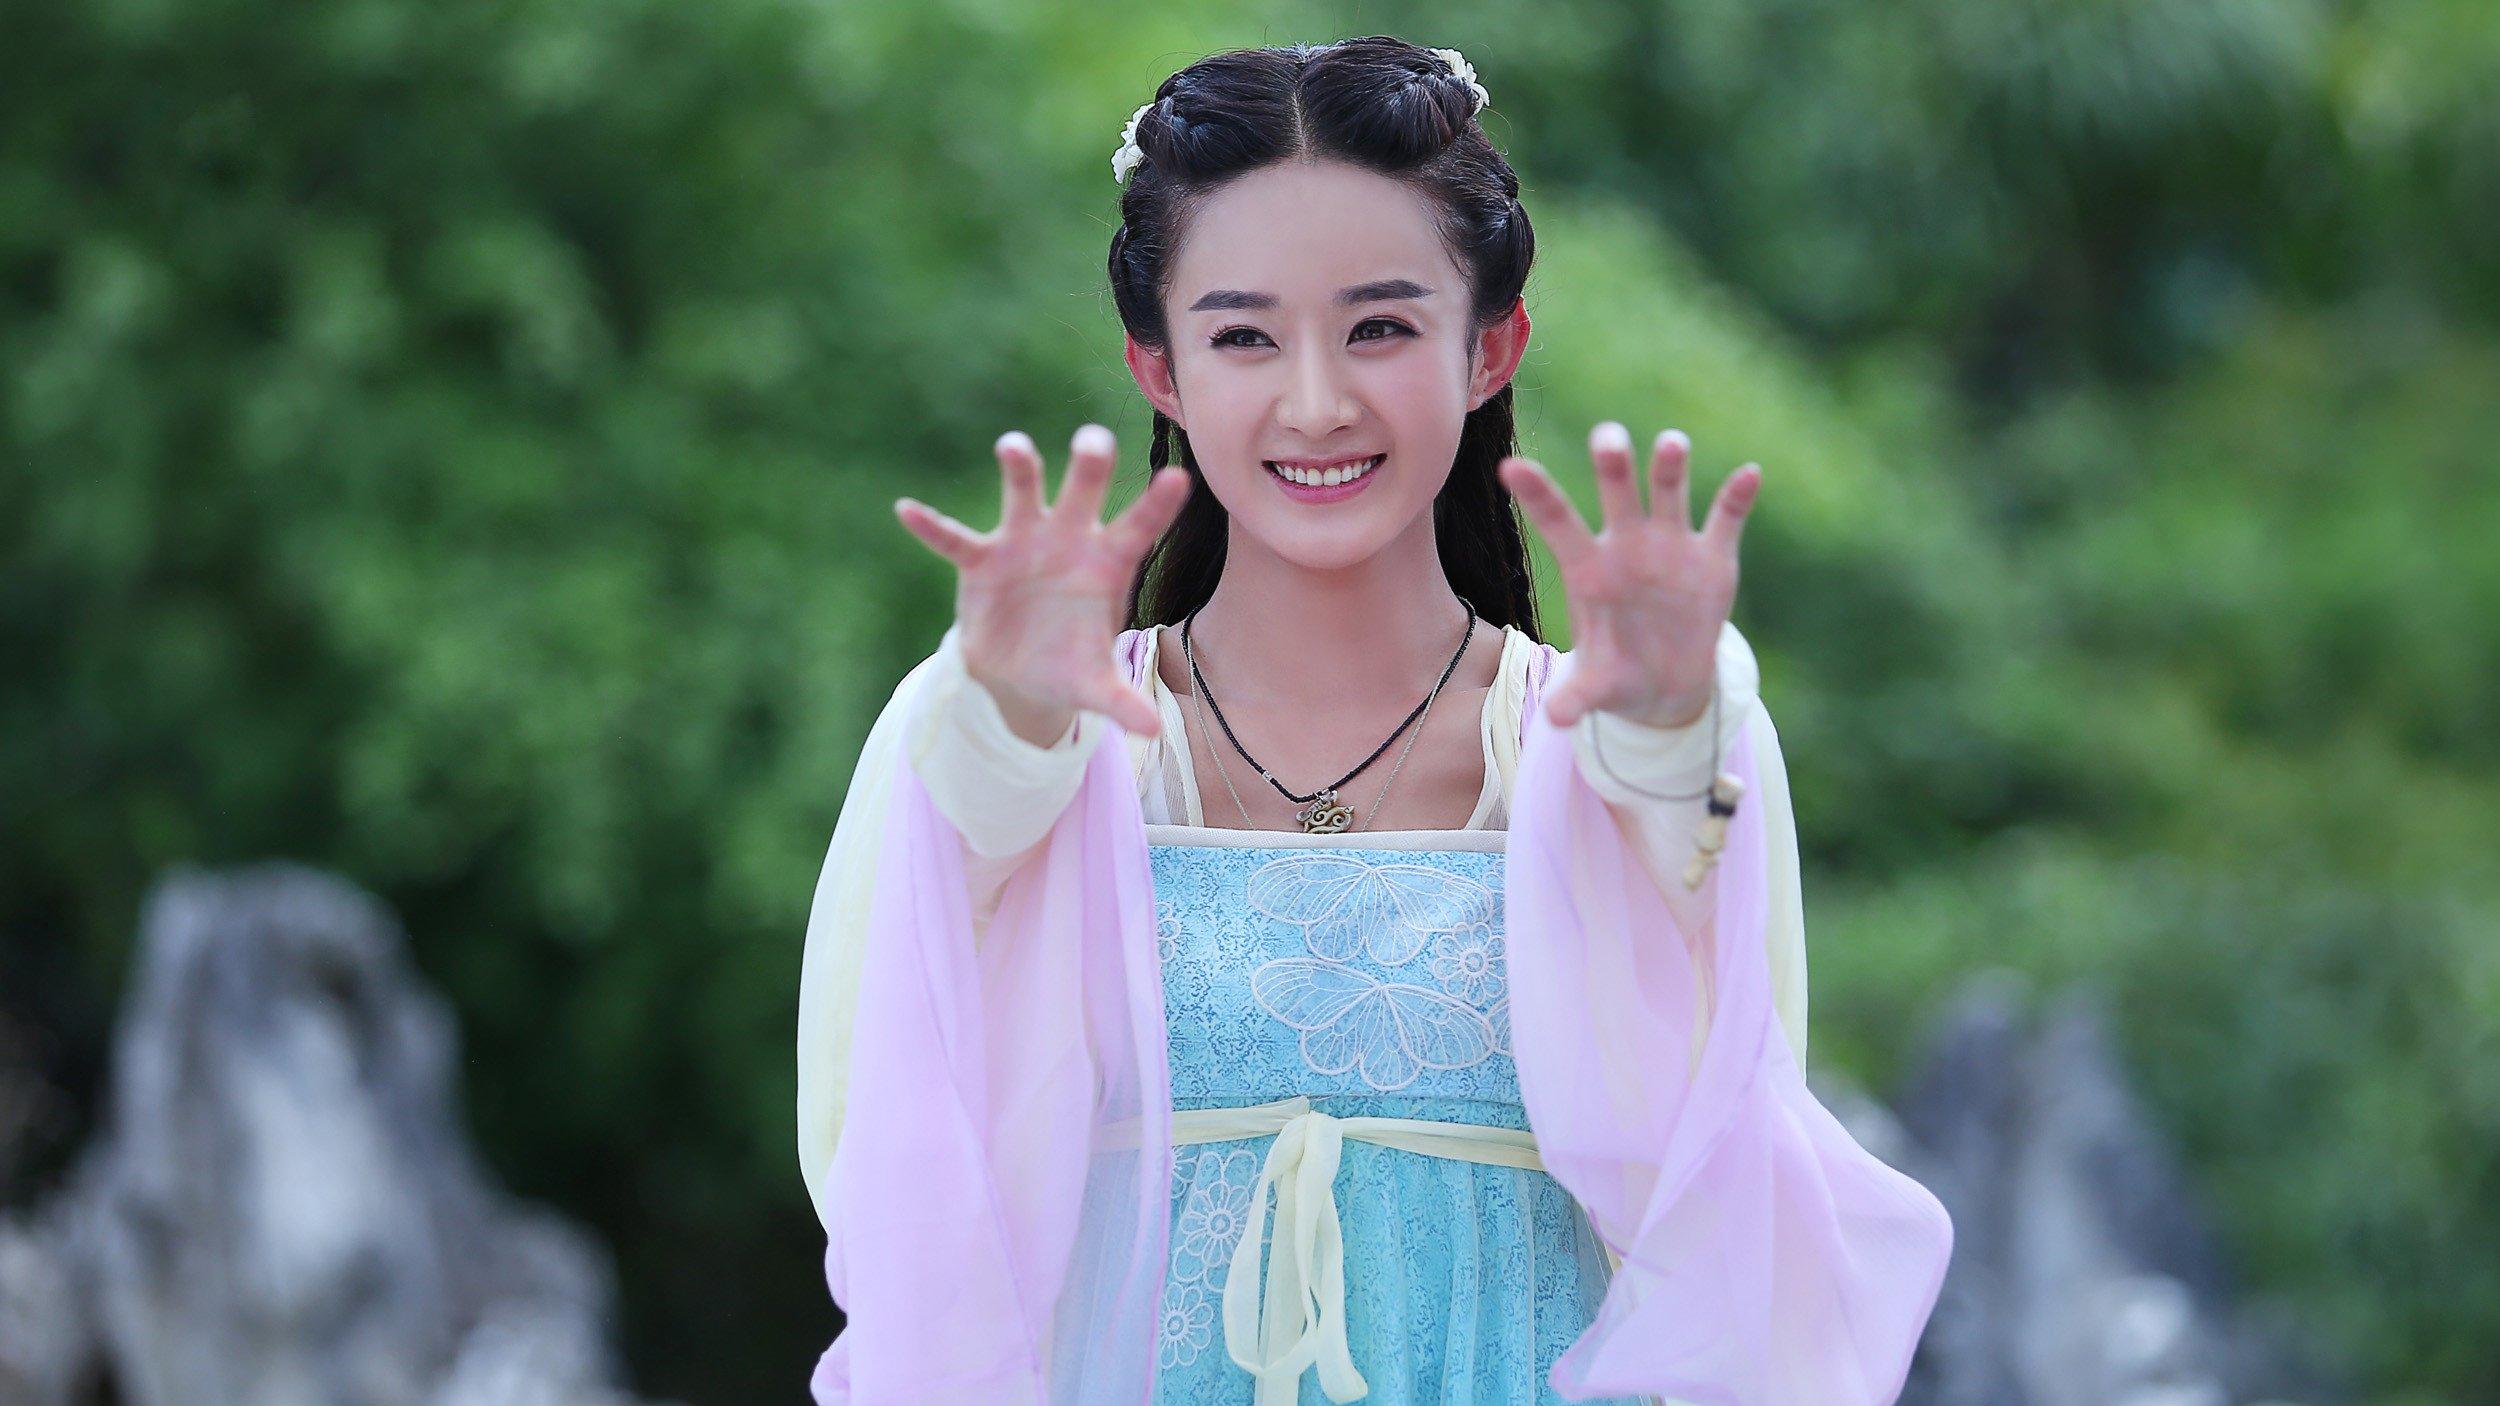 Ngam nhan sac 6 my nhan dang nam quyen luc showbiz Trung Quoc hinh anh 3